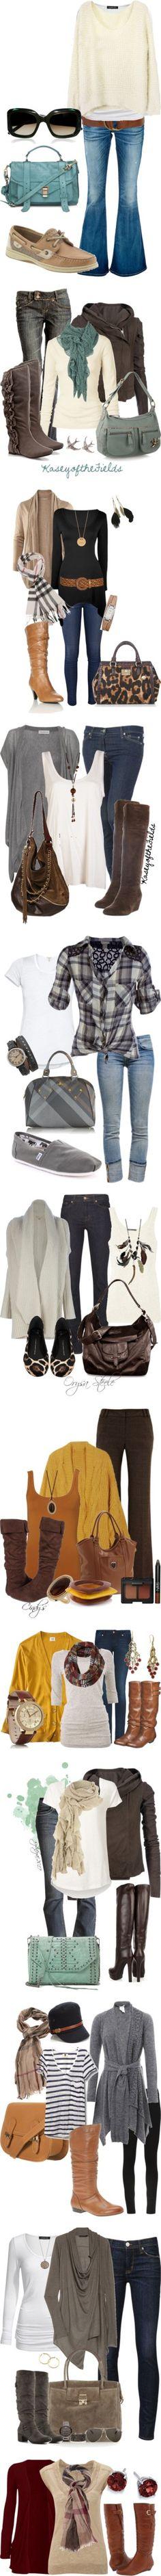 outfits, idea, fashion, fallwint style, cloth, casual comfort, beauti, closet, thing